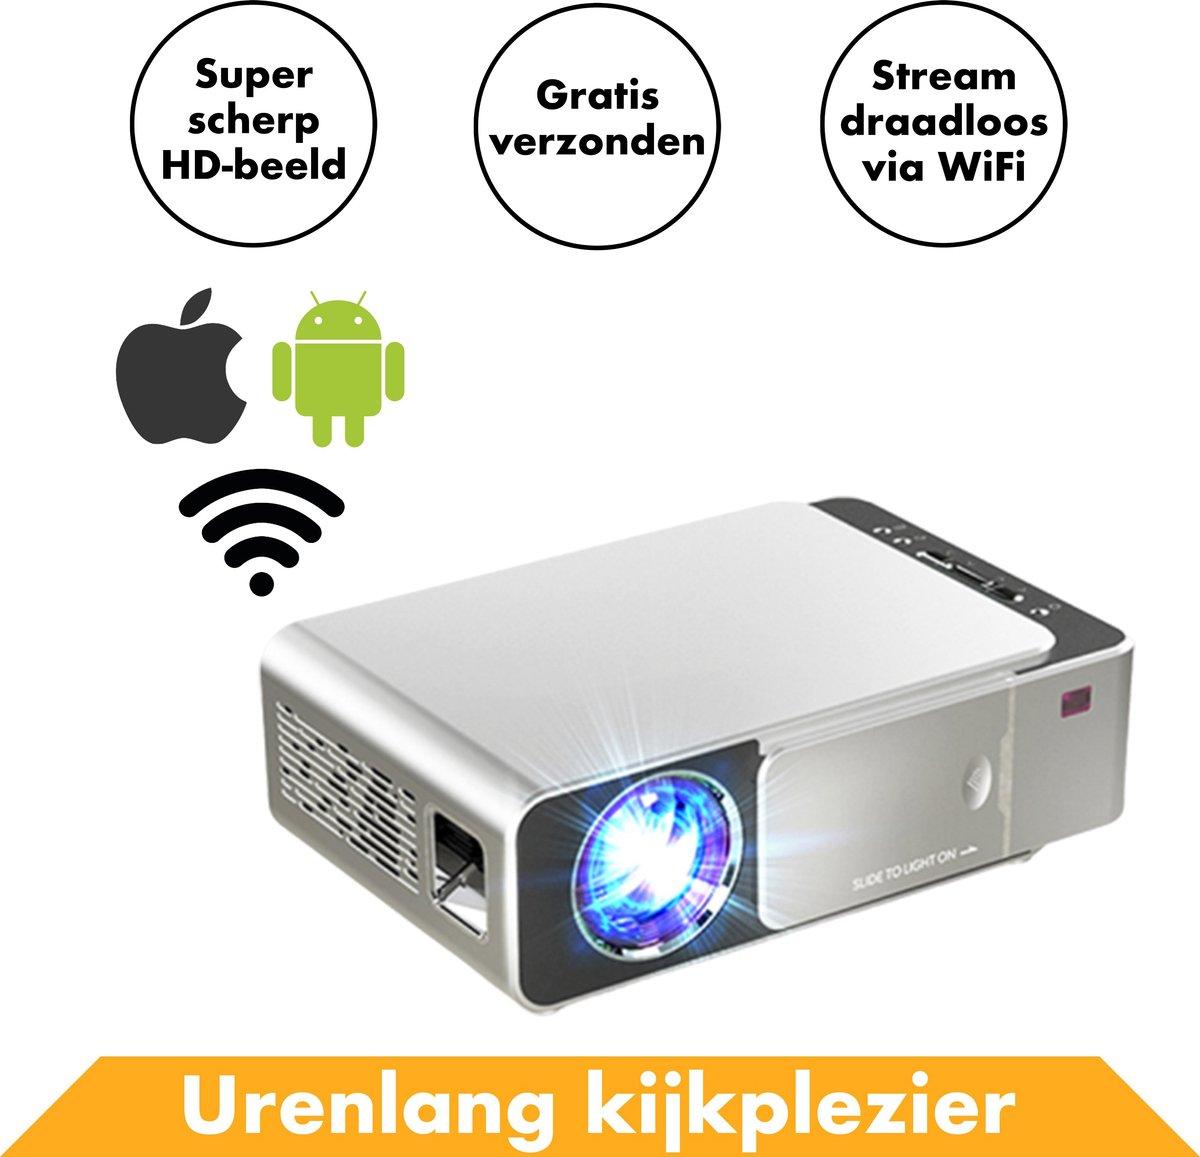 Streaming Beamer Projector Full HD van InRound - Compacte WiFi Projector met Apple & Android functie